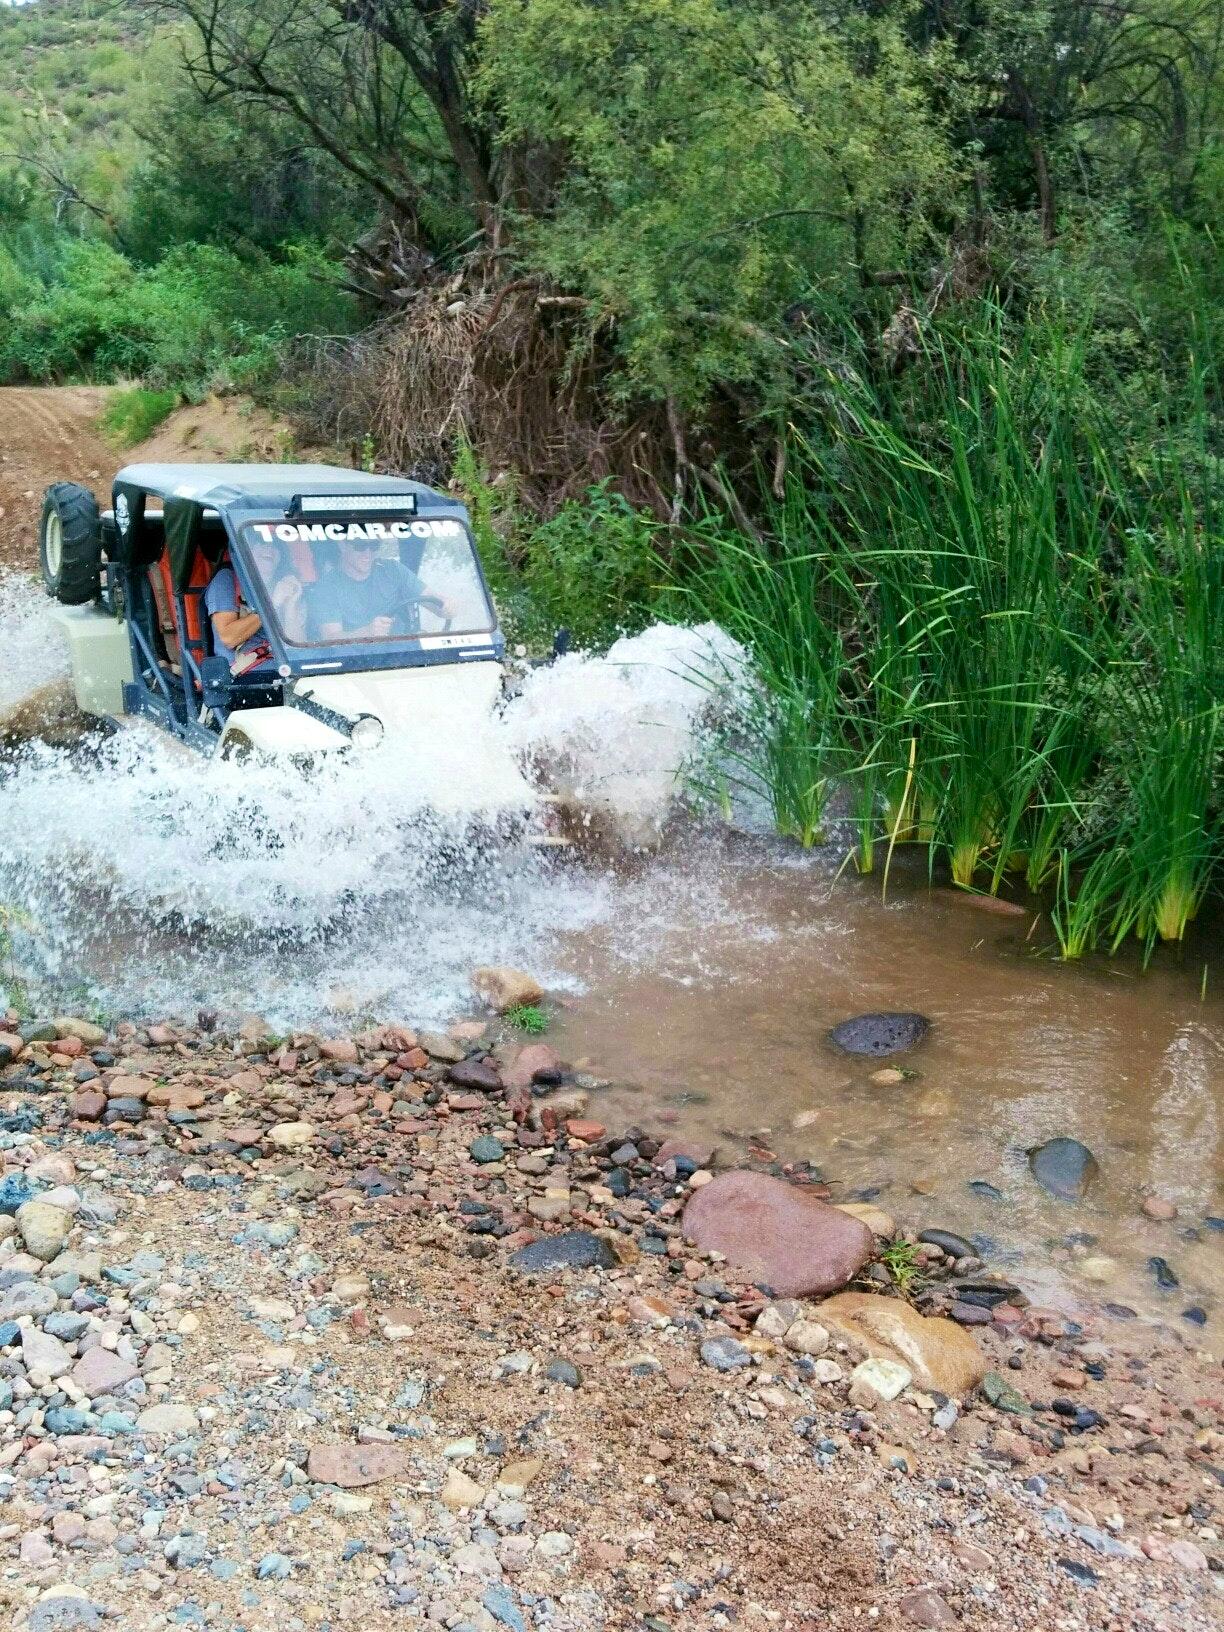 Tomcar ATV tour crossing river Scottsadle